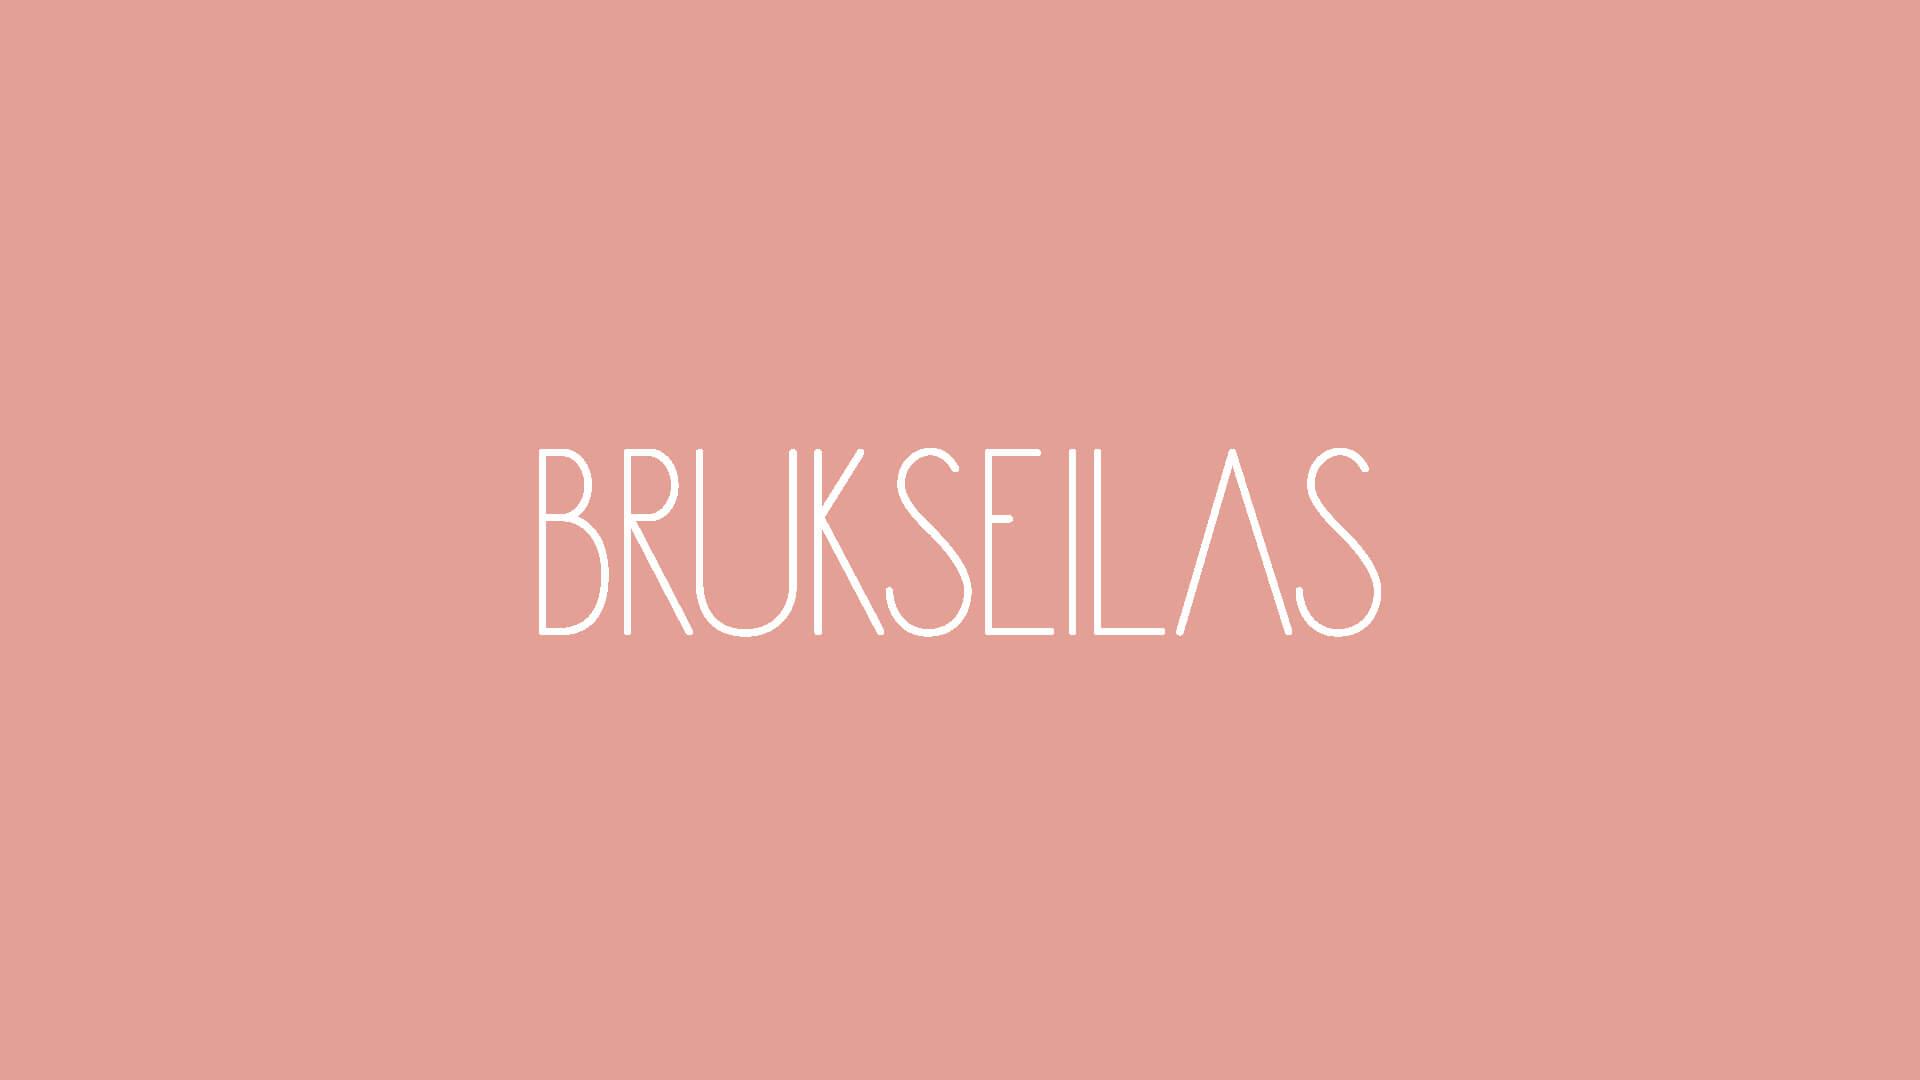 White Brukseilas Logo on a pink Background